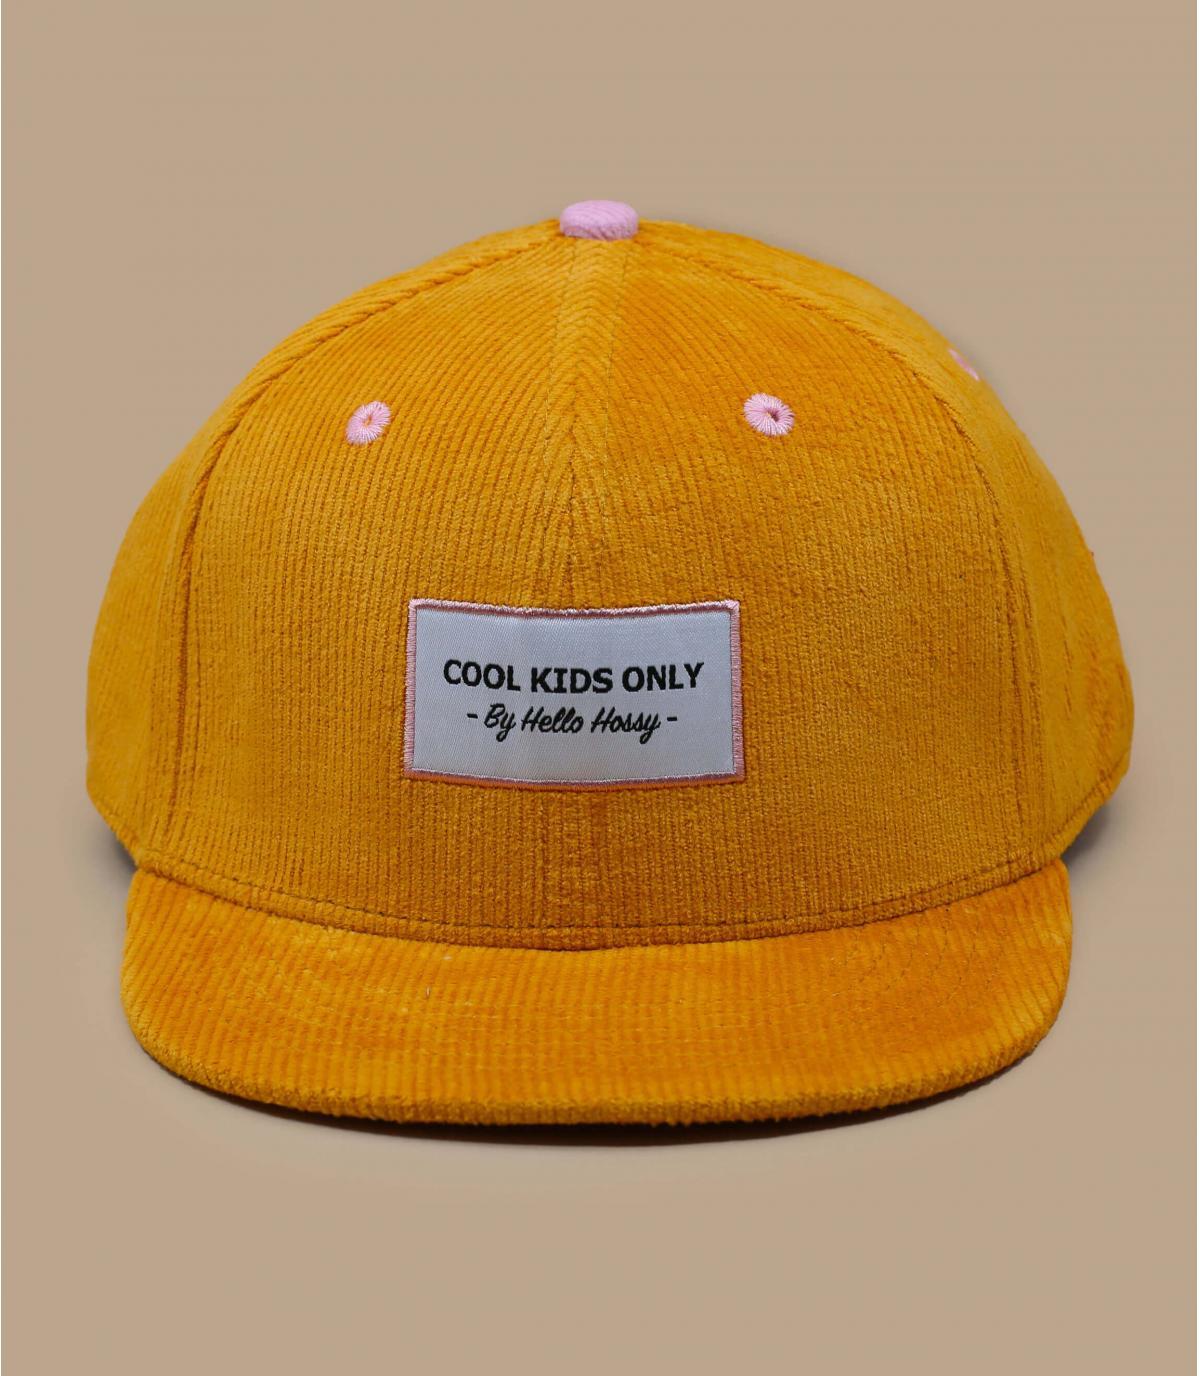 casquette enfant velours jaune